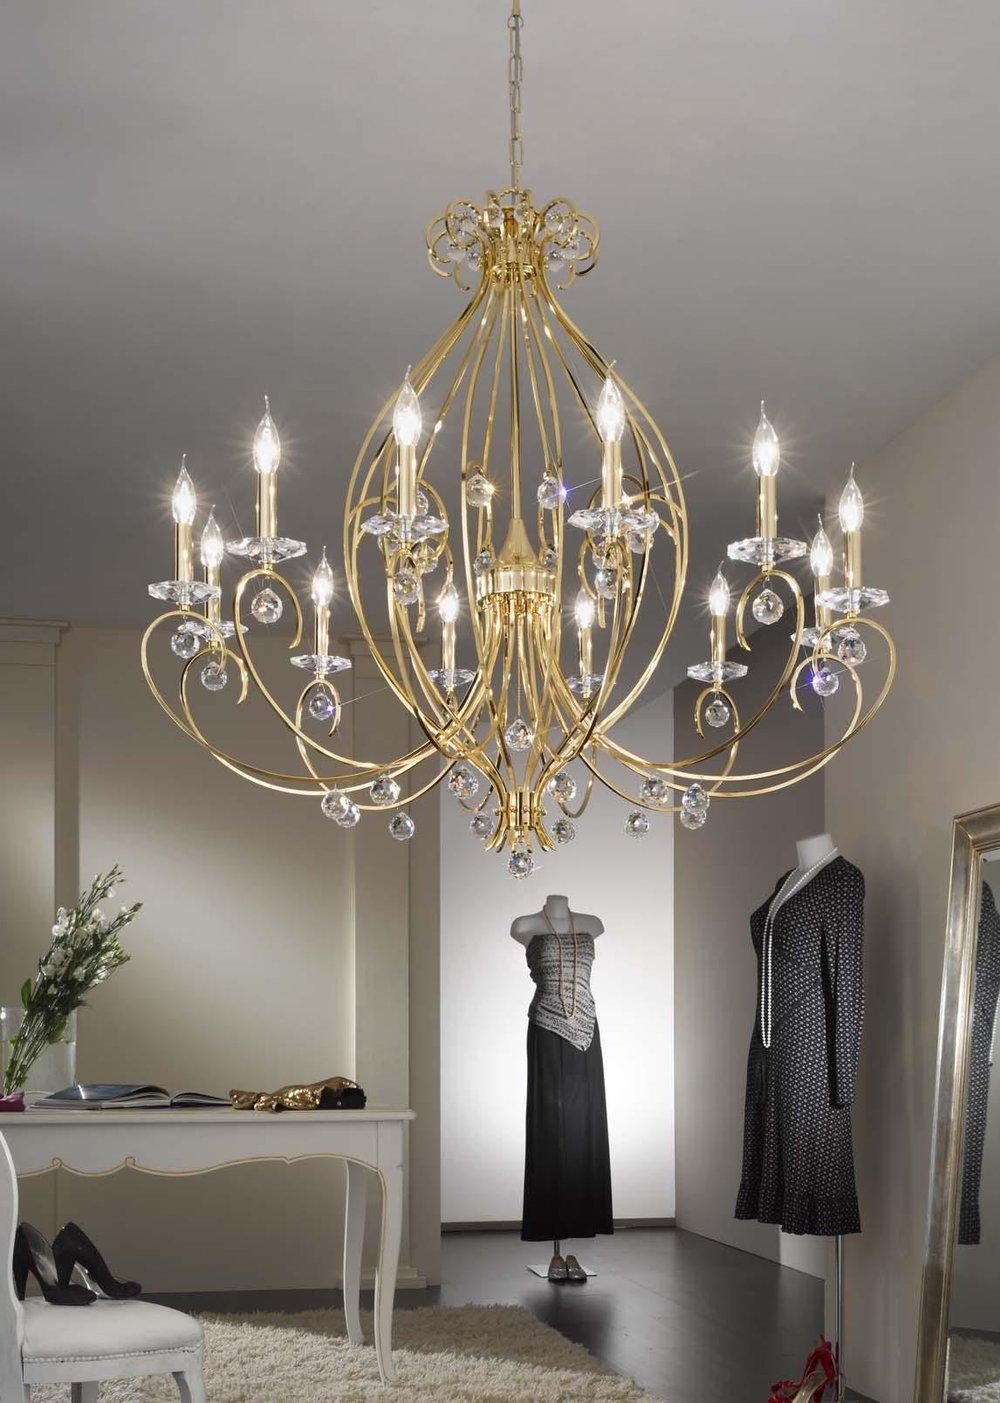 carat-gold-12-light-crystal-chandelier-kolarz-lighting-9050-p.jpg